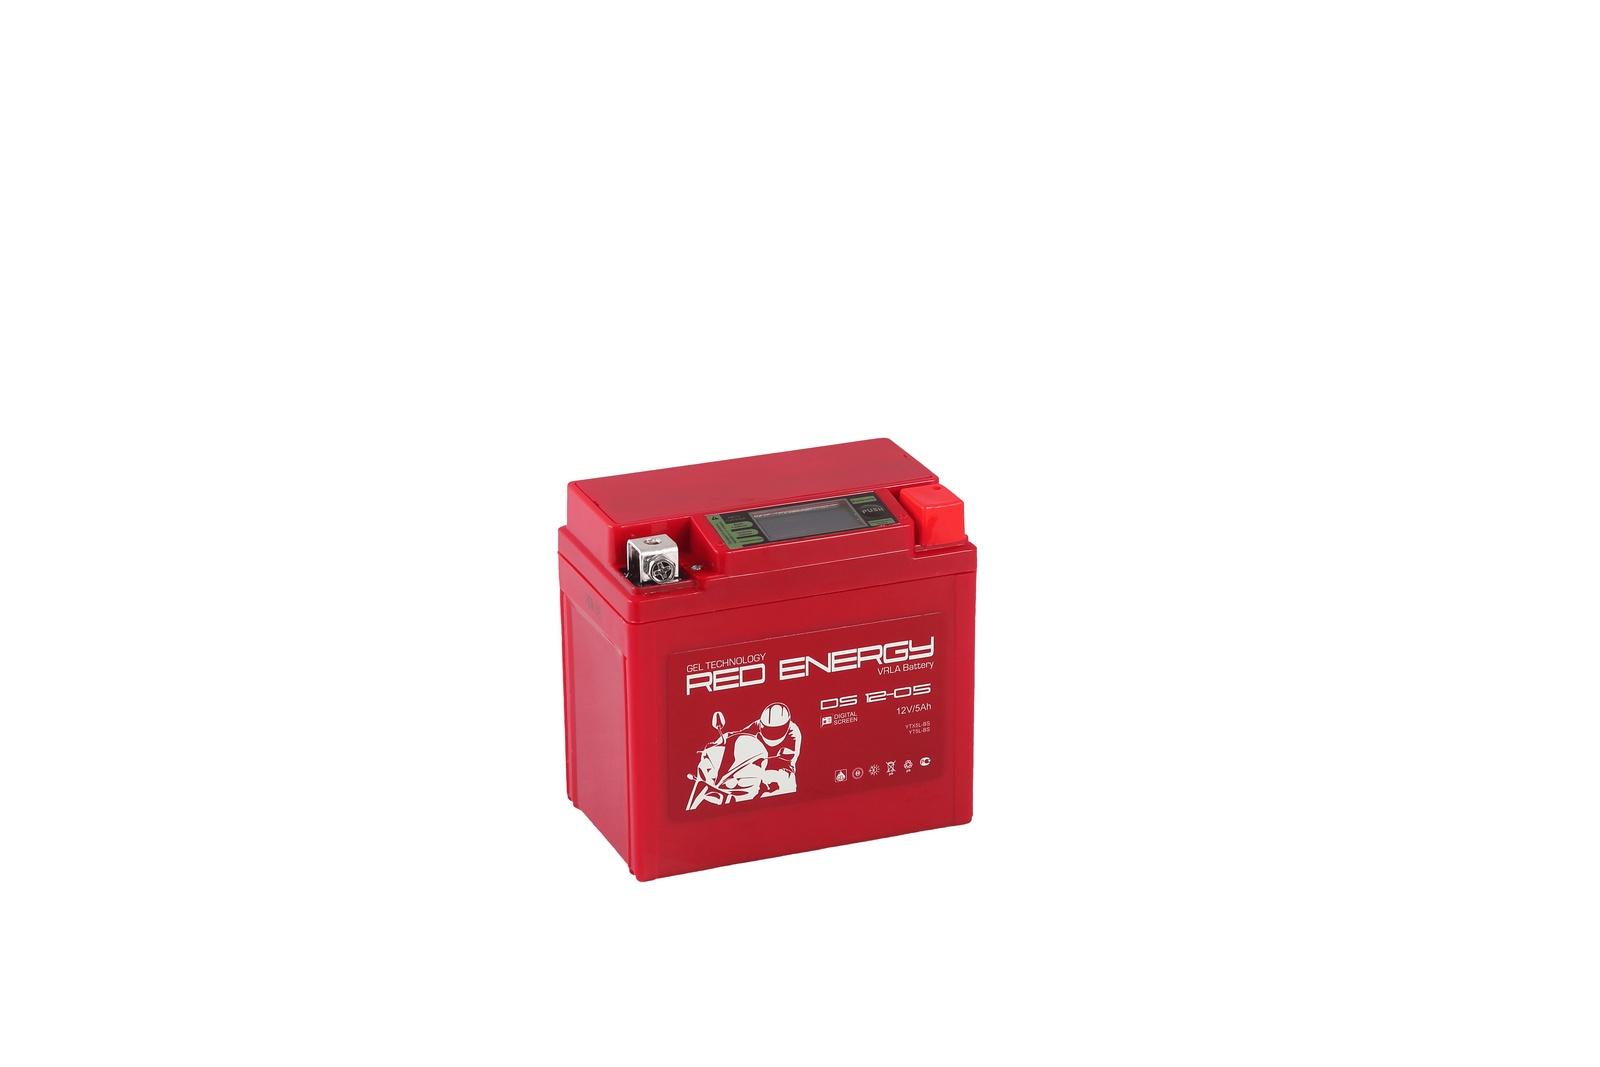 Аккумулятор для мототехники Red Energy DS 1205 все цены